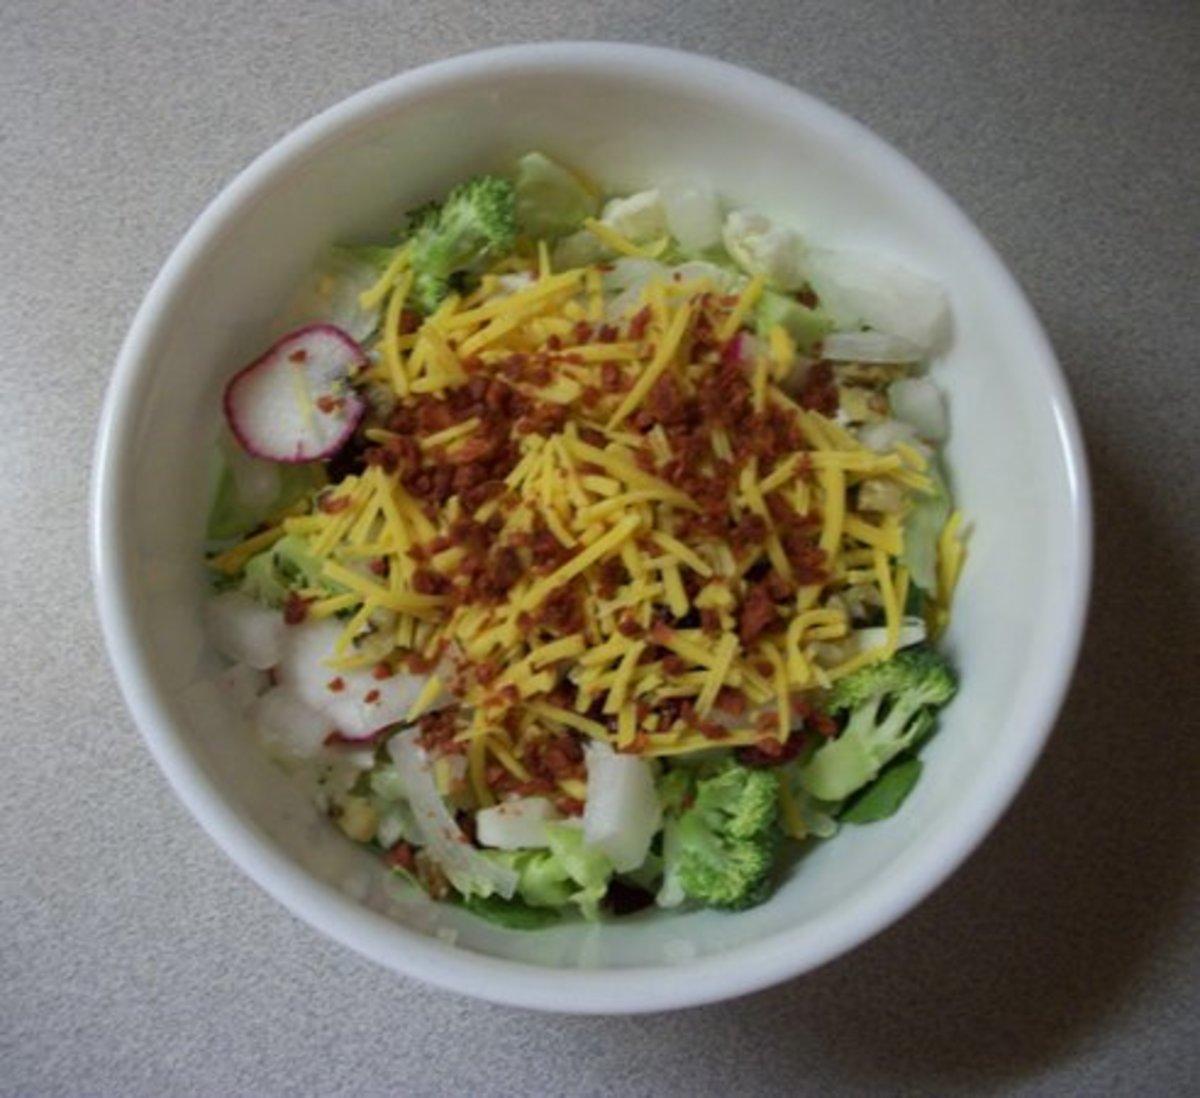 Ken's Favorite Tossed Salad Recipe